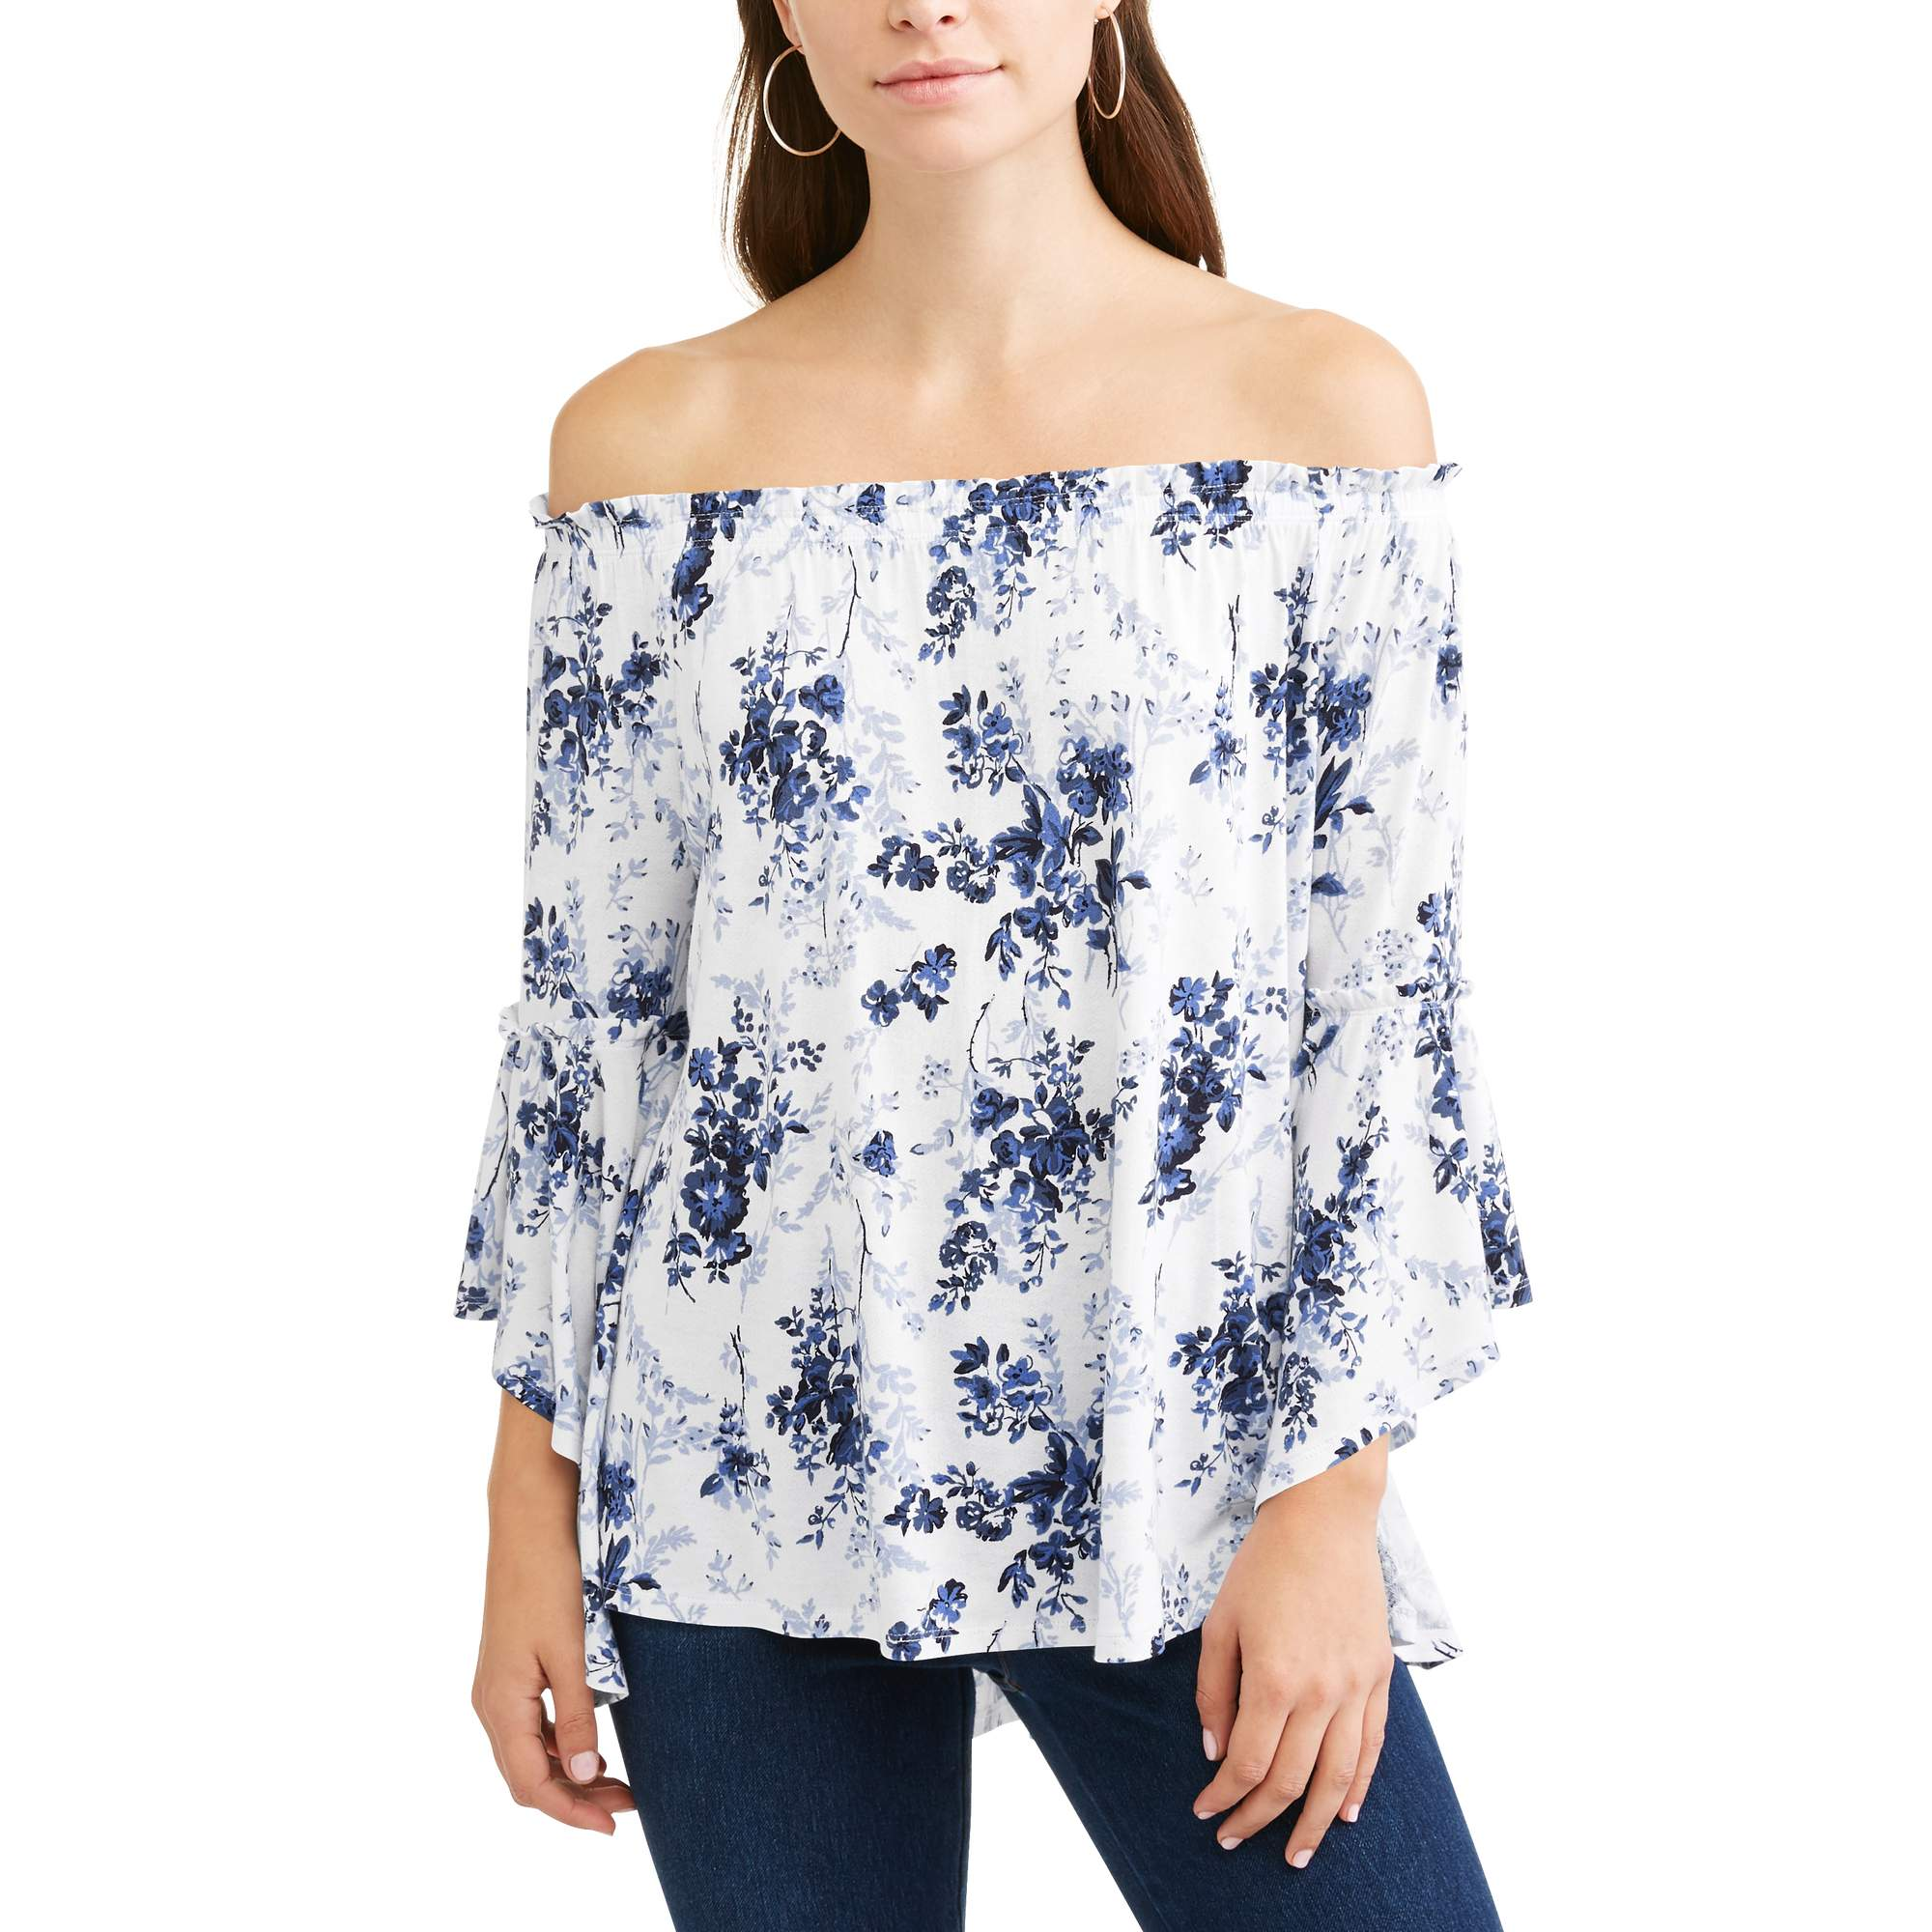 4958212e94ce9 Time and Tru - Women s Off Shoulder Shirred Flutter Sleeve Top - Walmart.com